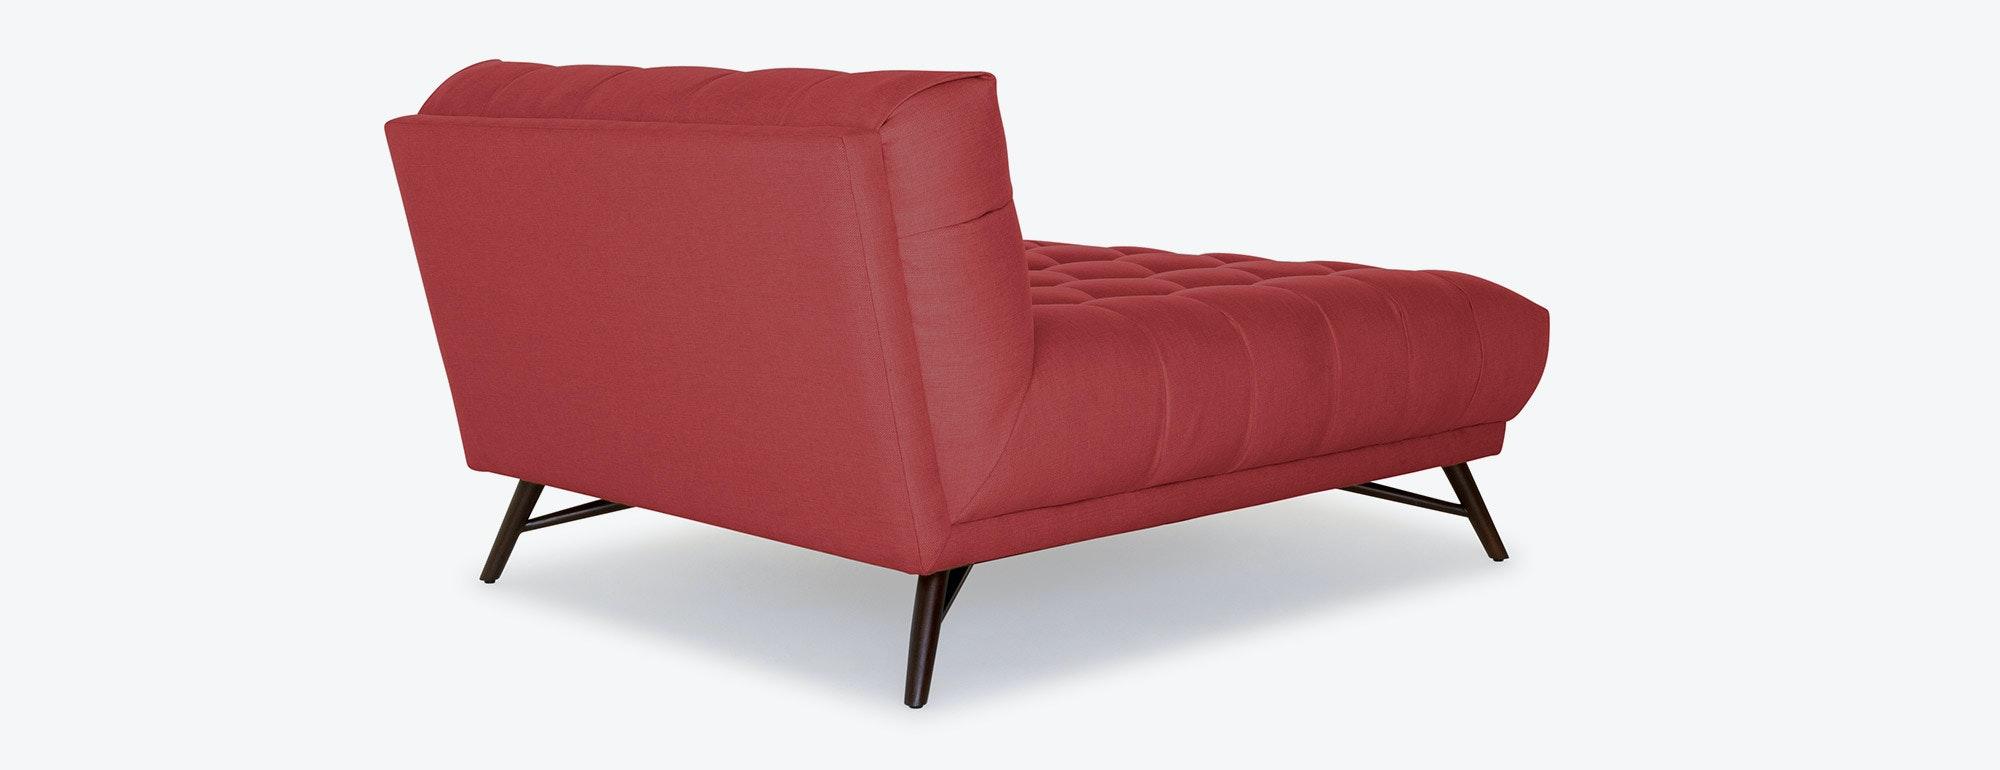 ocean park armless chaise joybird. Black Bedroom Furniture Sets. Home Design Ideas